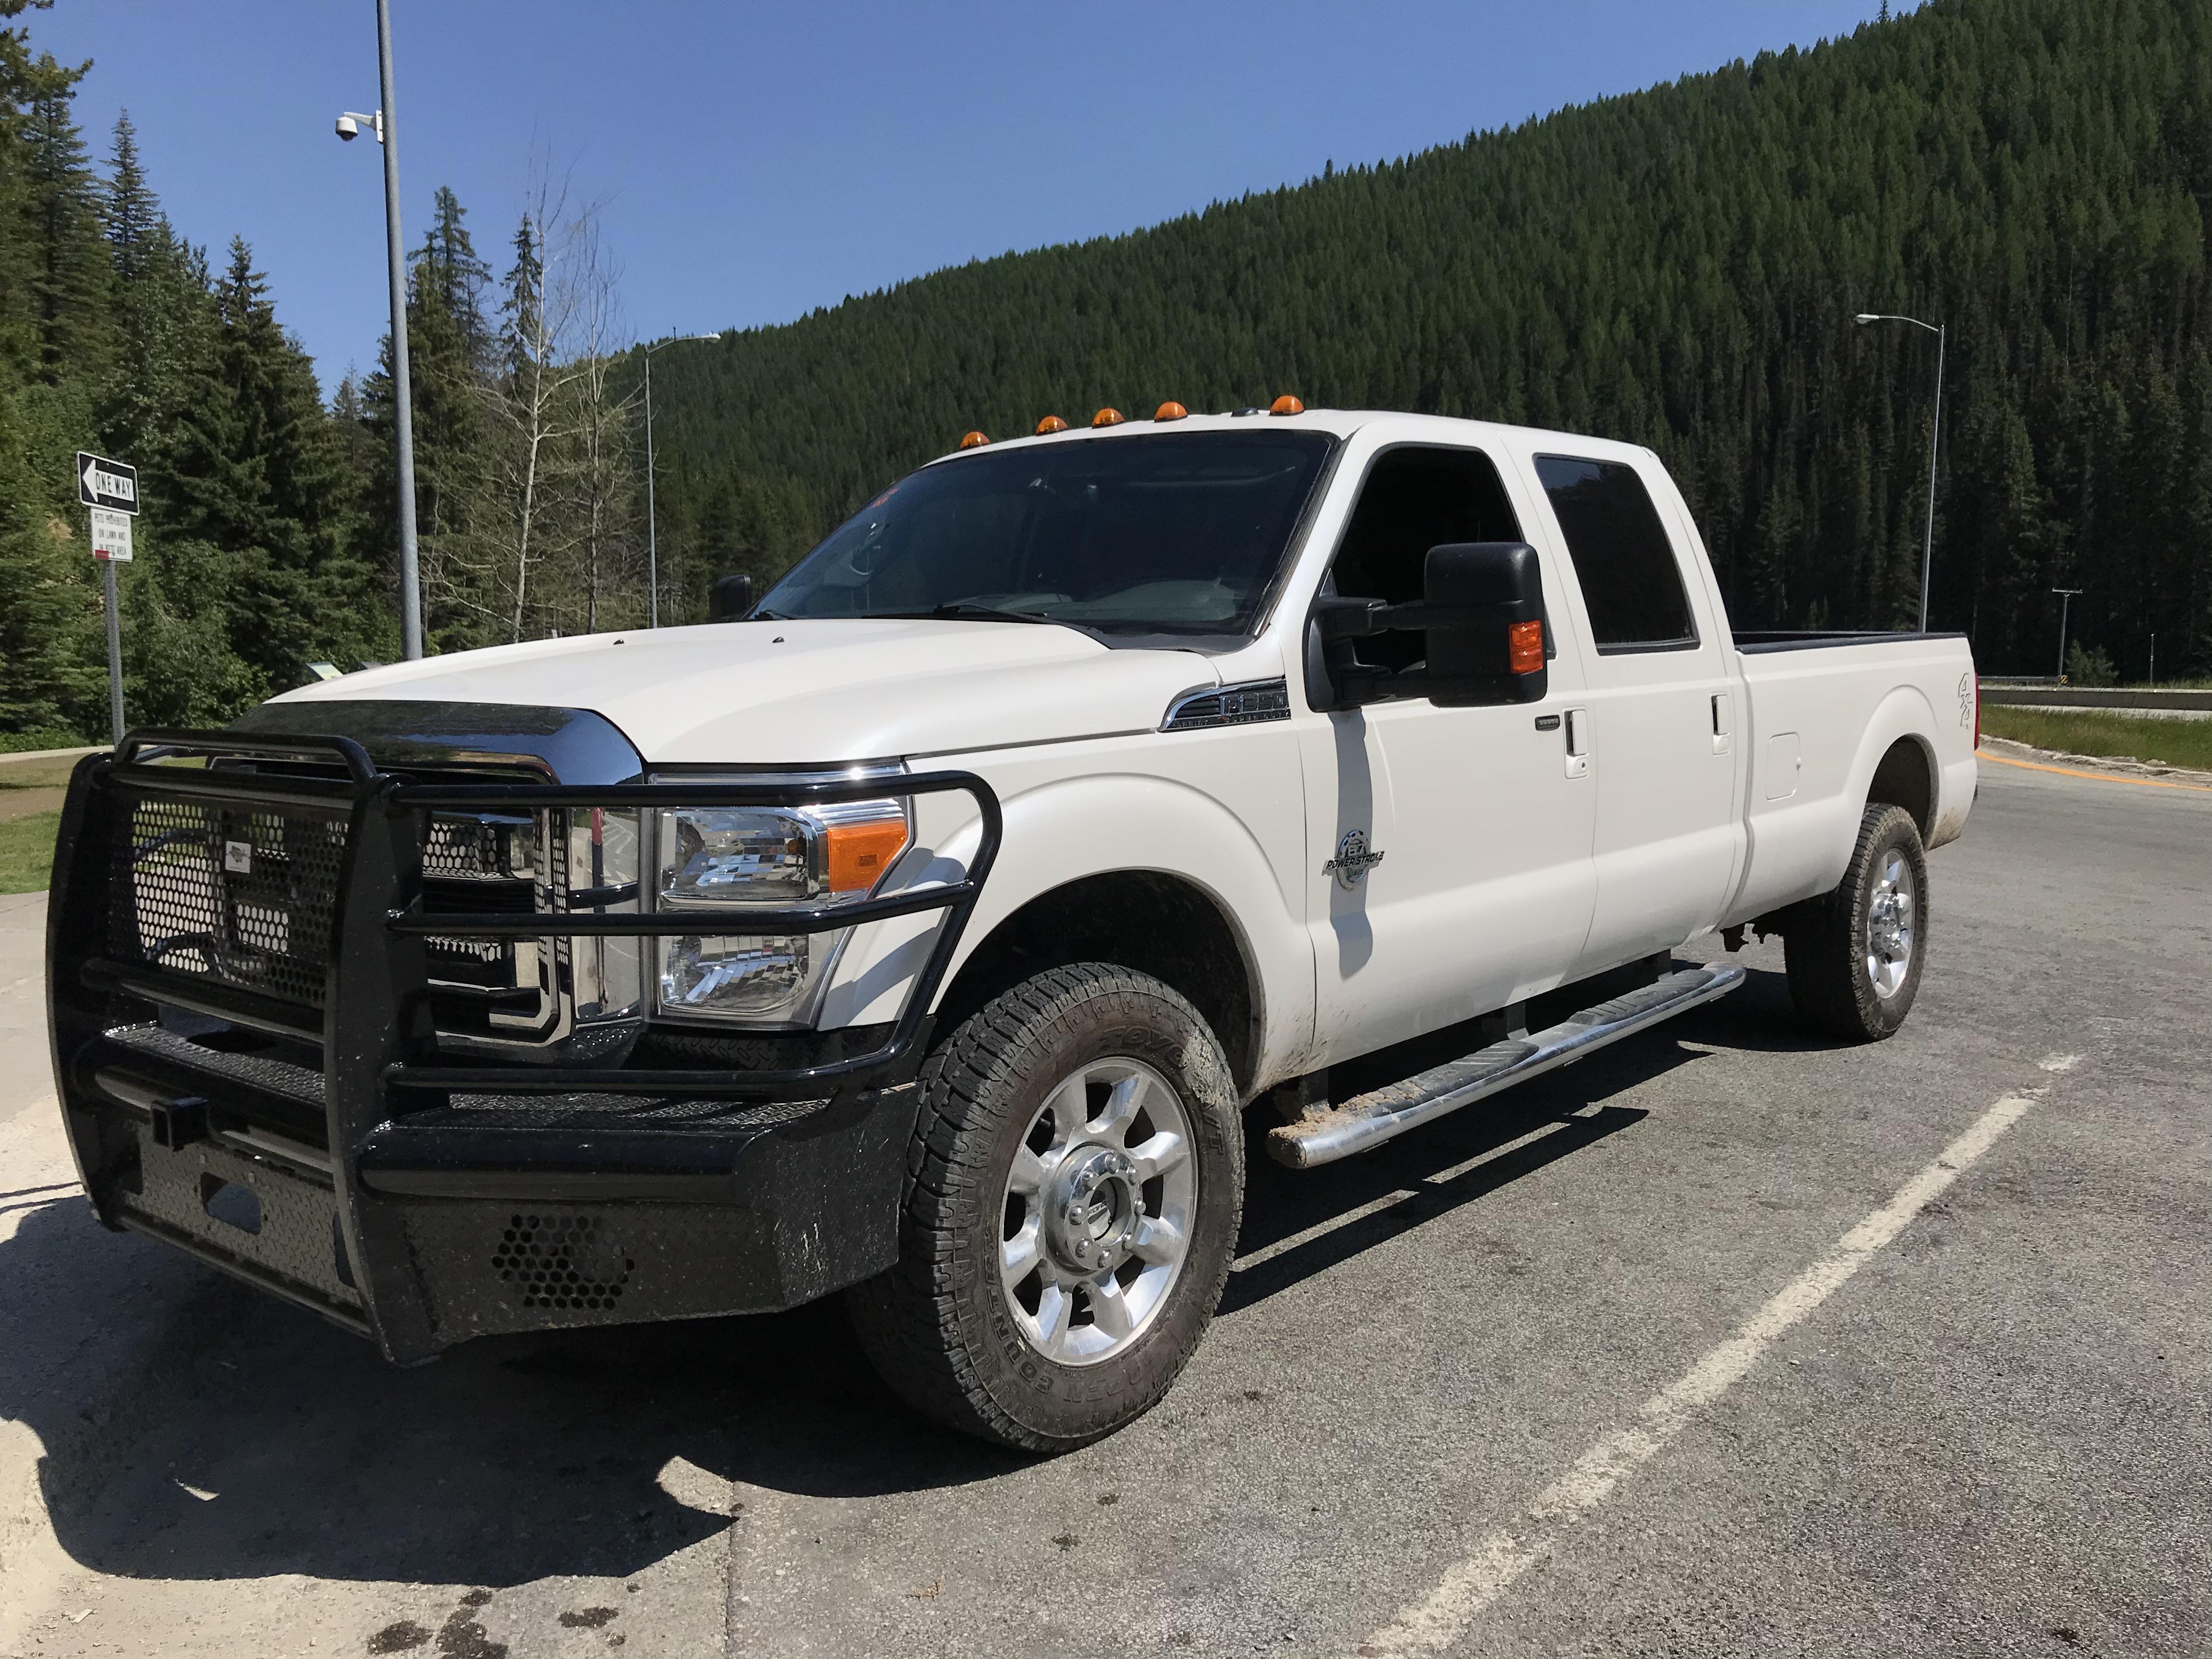 6 7 Powerstroke Problems >> New To Diesels Longevity Wise Is It True Ford